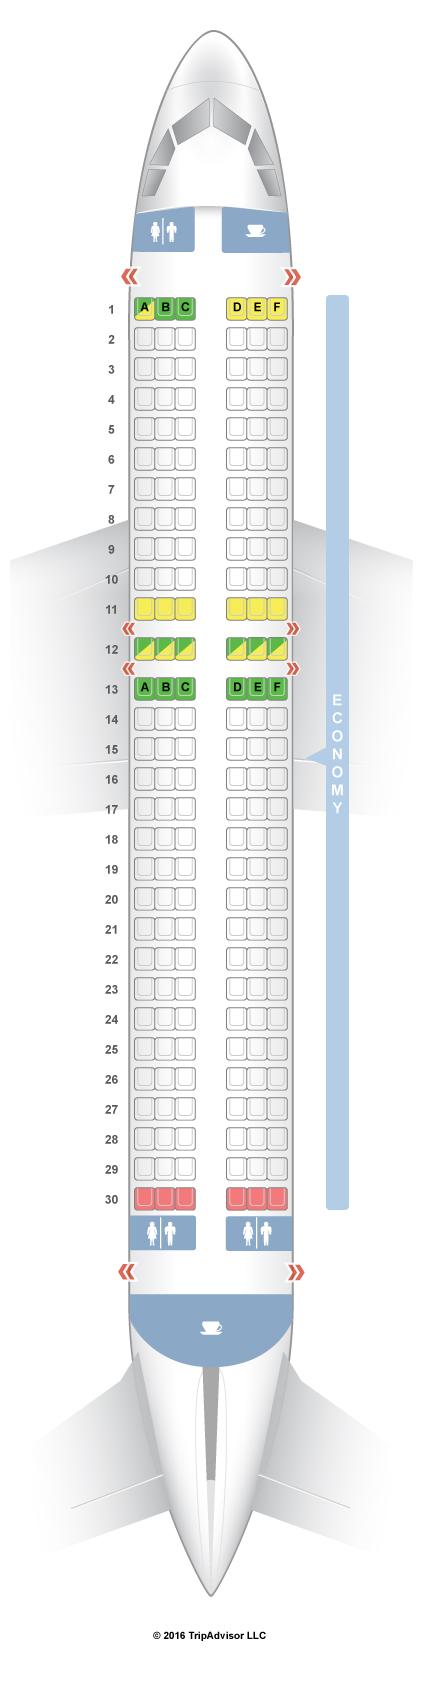 Seatguru Seat Map Jetstar Airbus A320 320